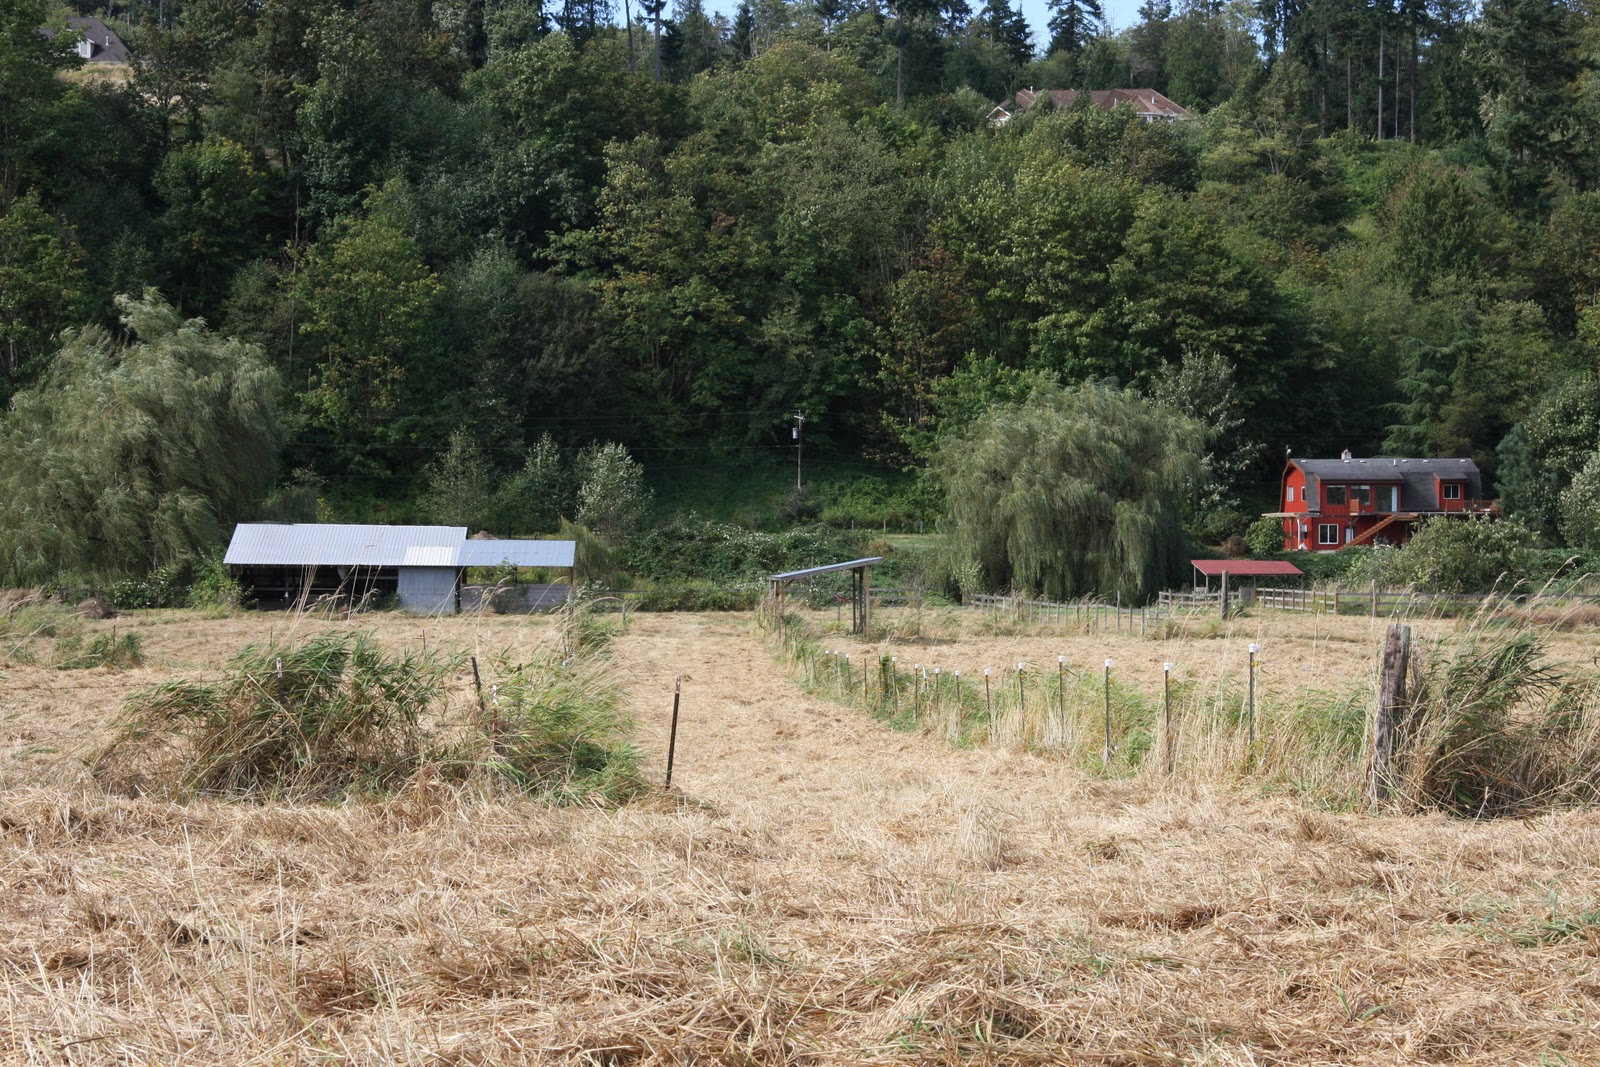 Quarter acre farm - Craigslist snohomish county farm and garden ...